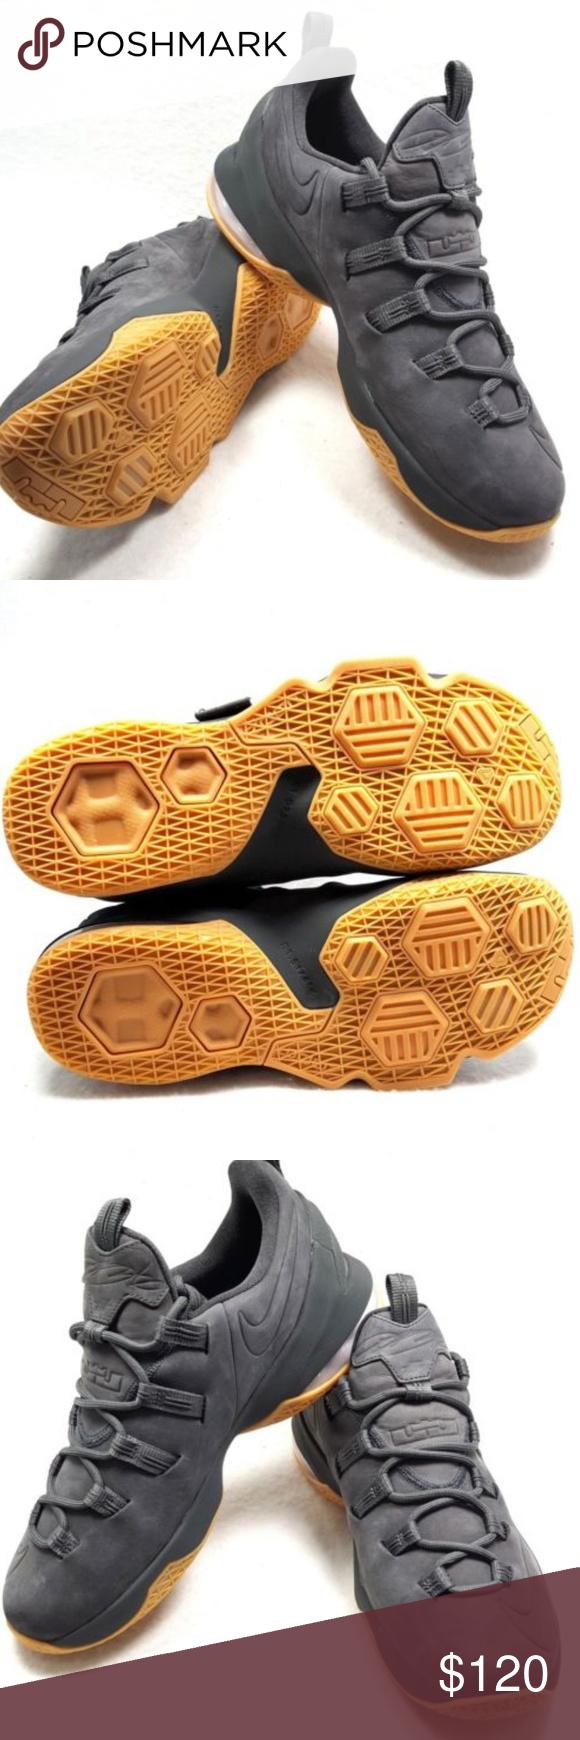 8c15a08fbd5b Nike Lebron XIII 13 Low PRM Premium Anthracite  Brand New